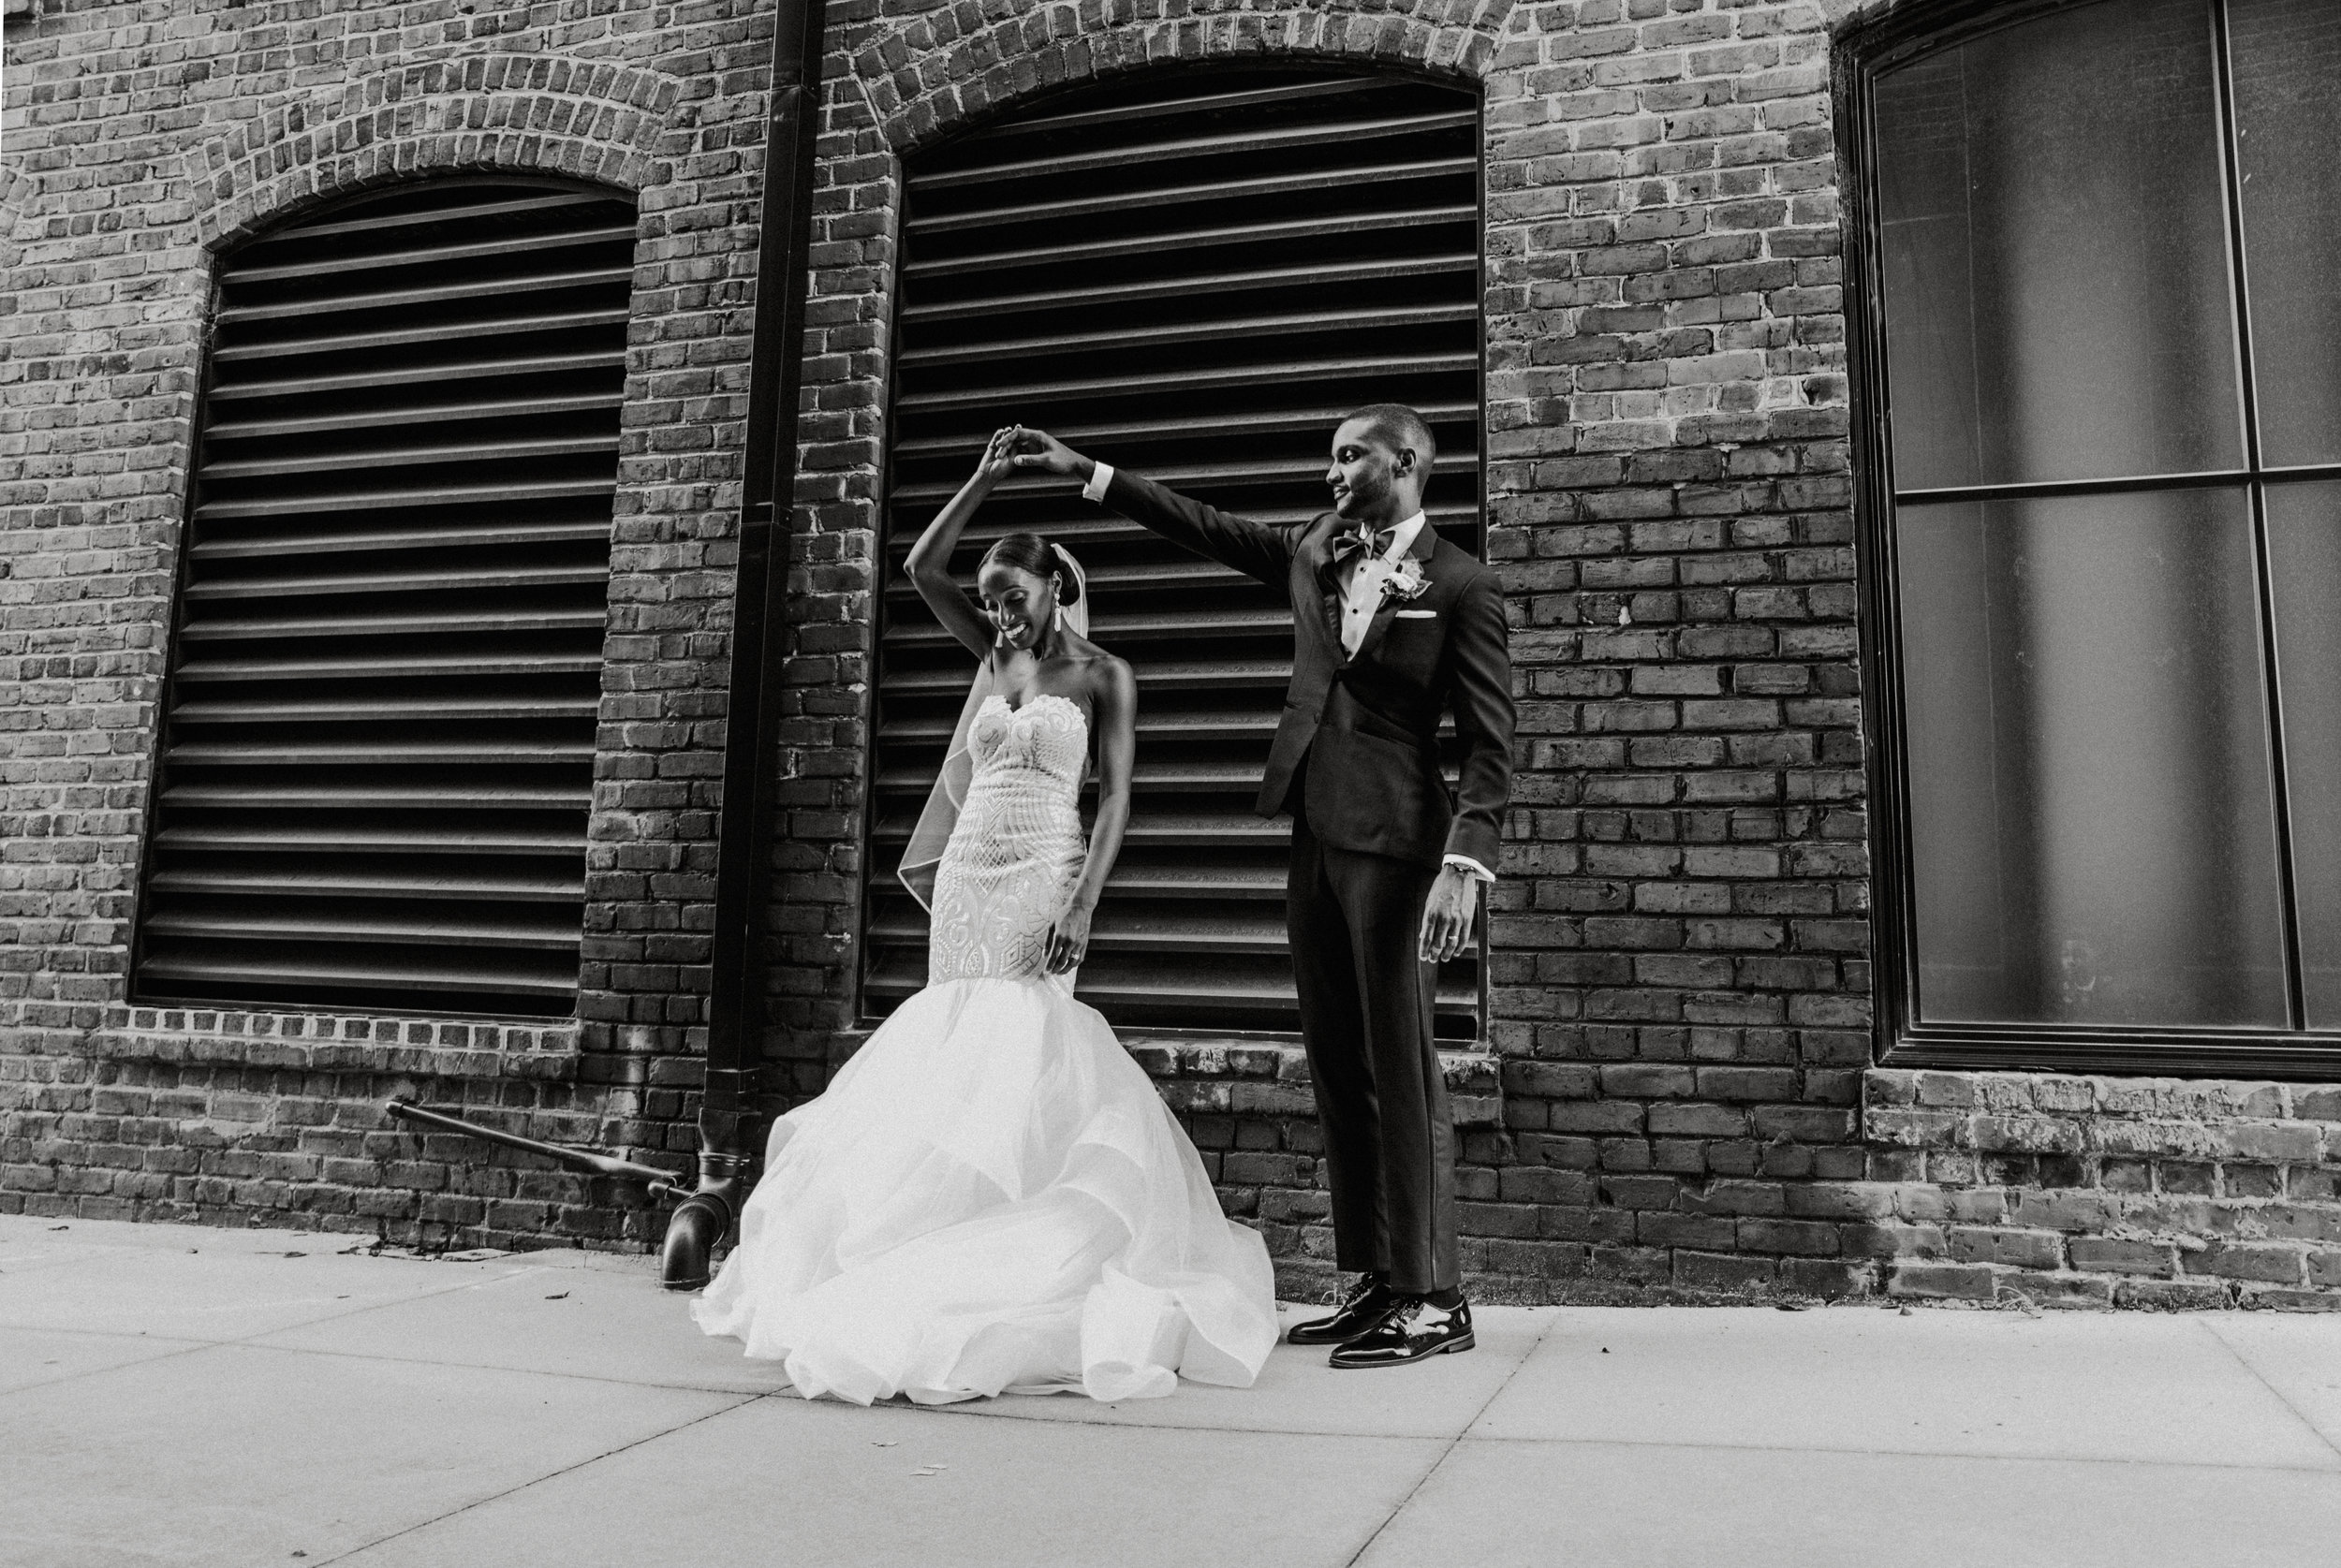 The Lofts at Union Square, High Point, NC. Wedding Photos, Wedding Portraits, Black and White Wedding Photo. North Carolina Wedding Photographer, Marina Rey Photography.